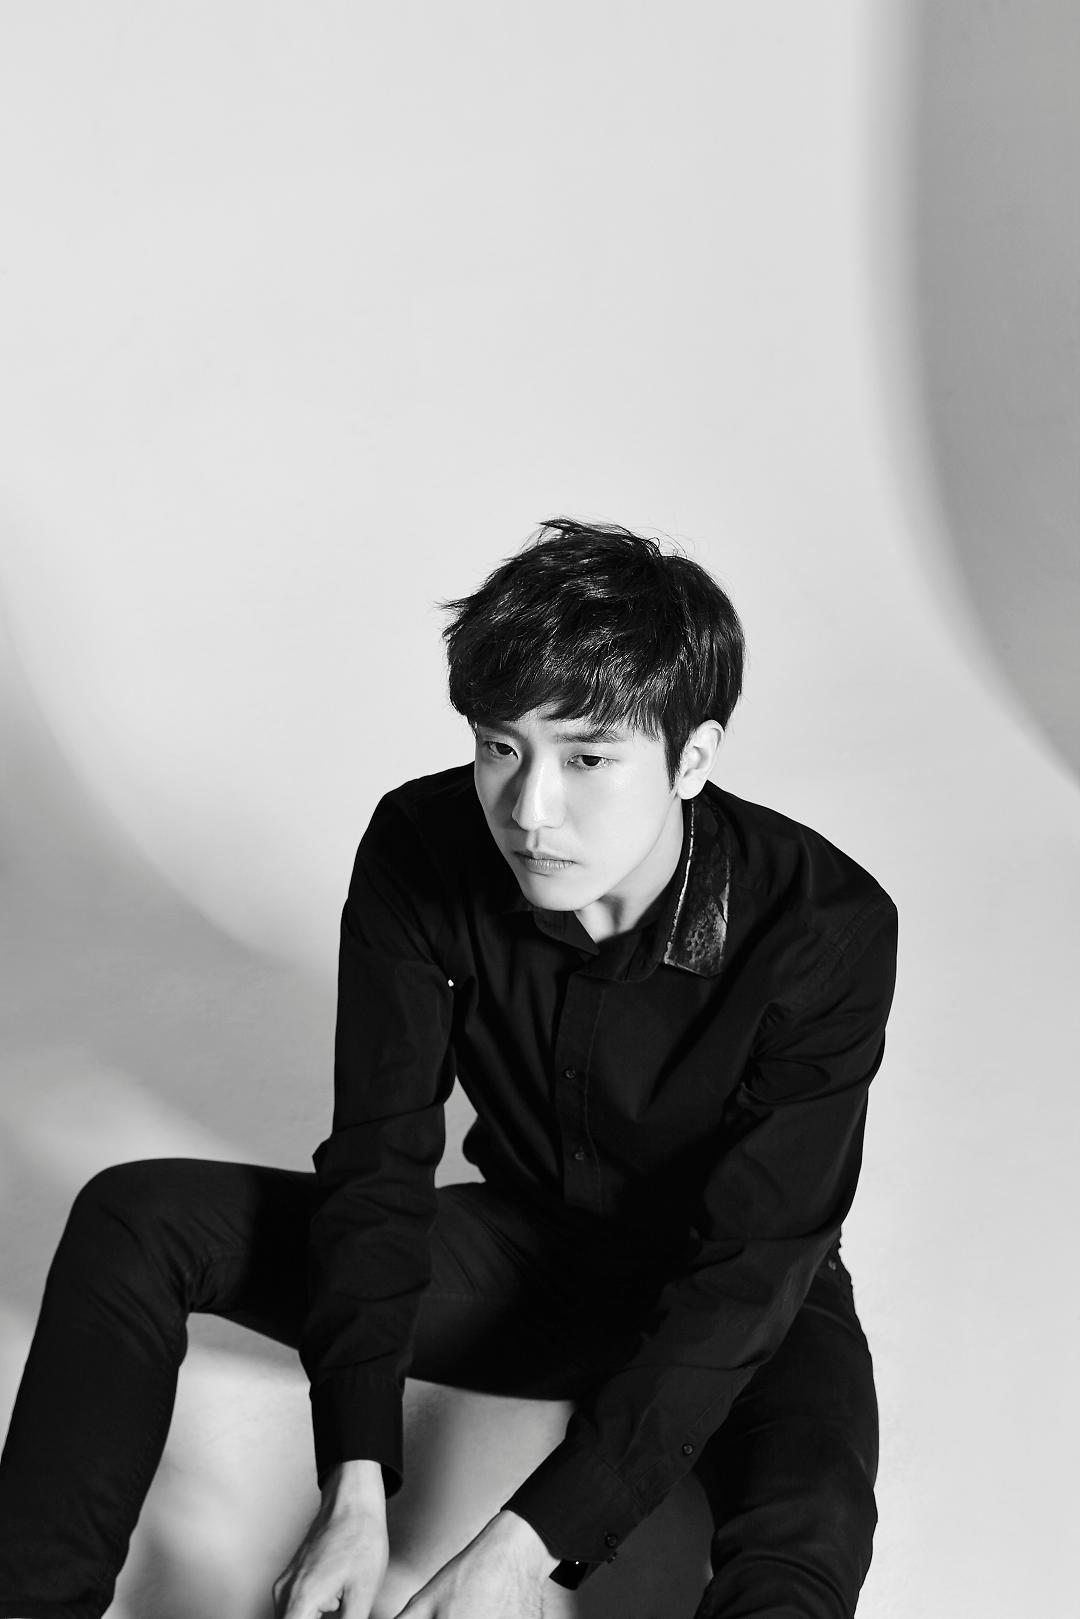 Cho Hyung Woo